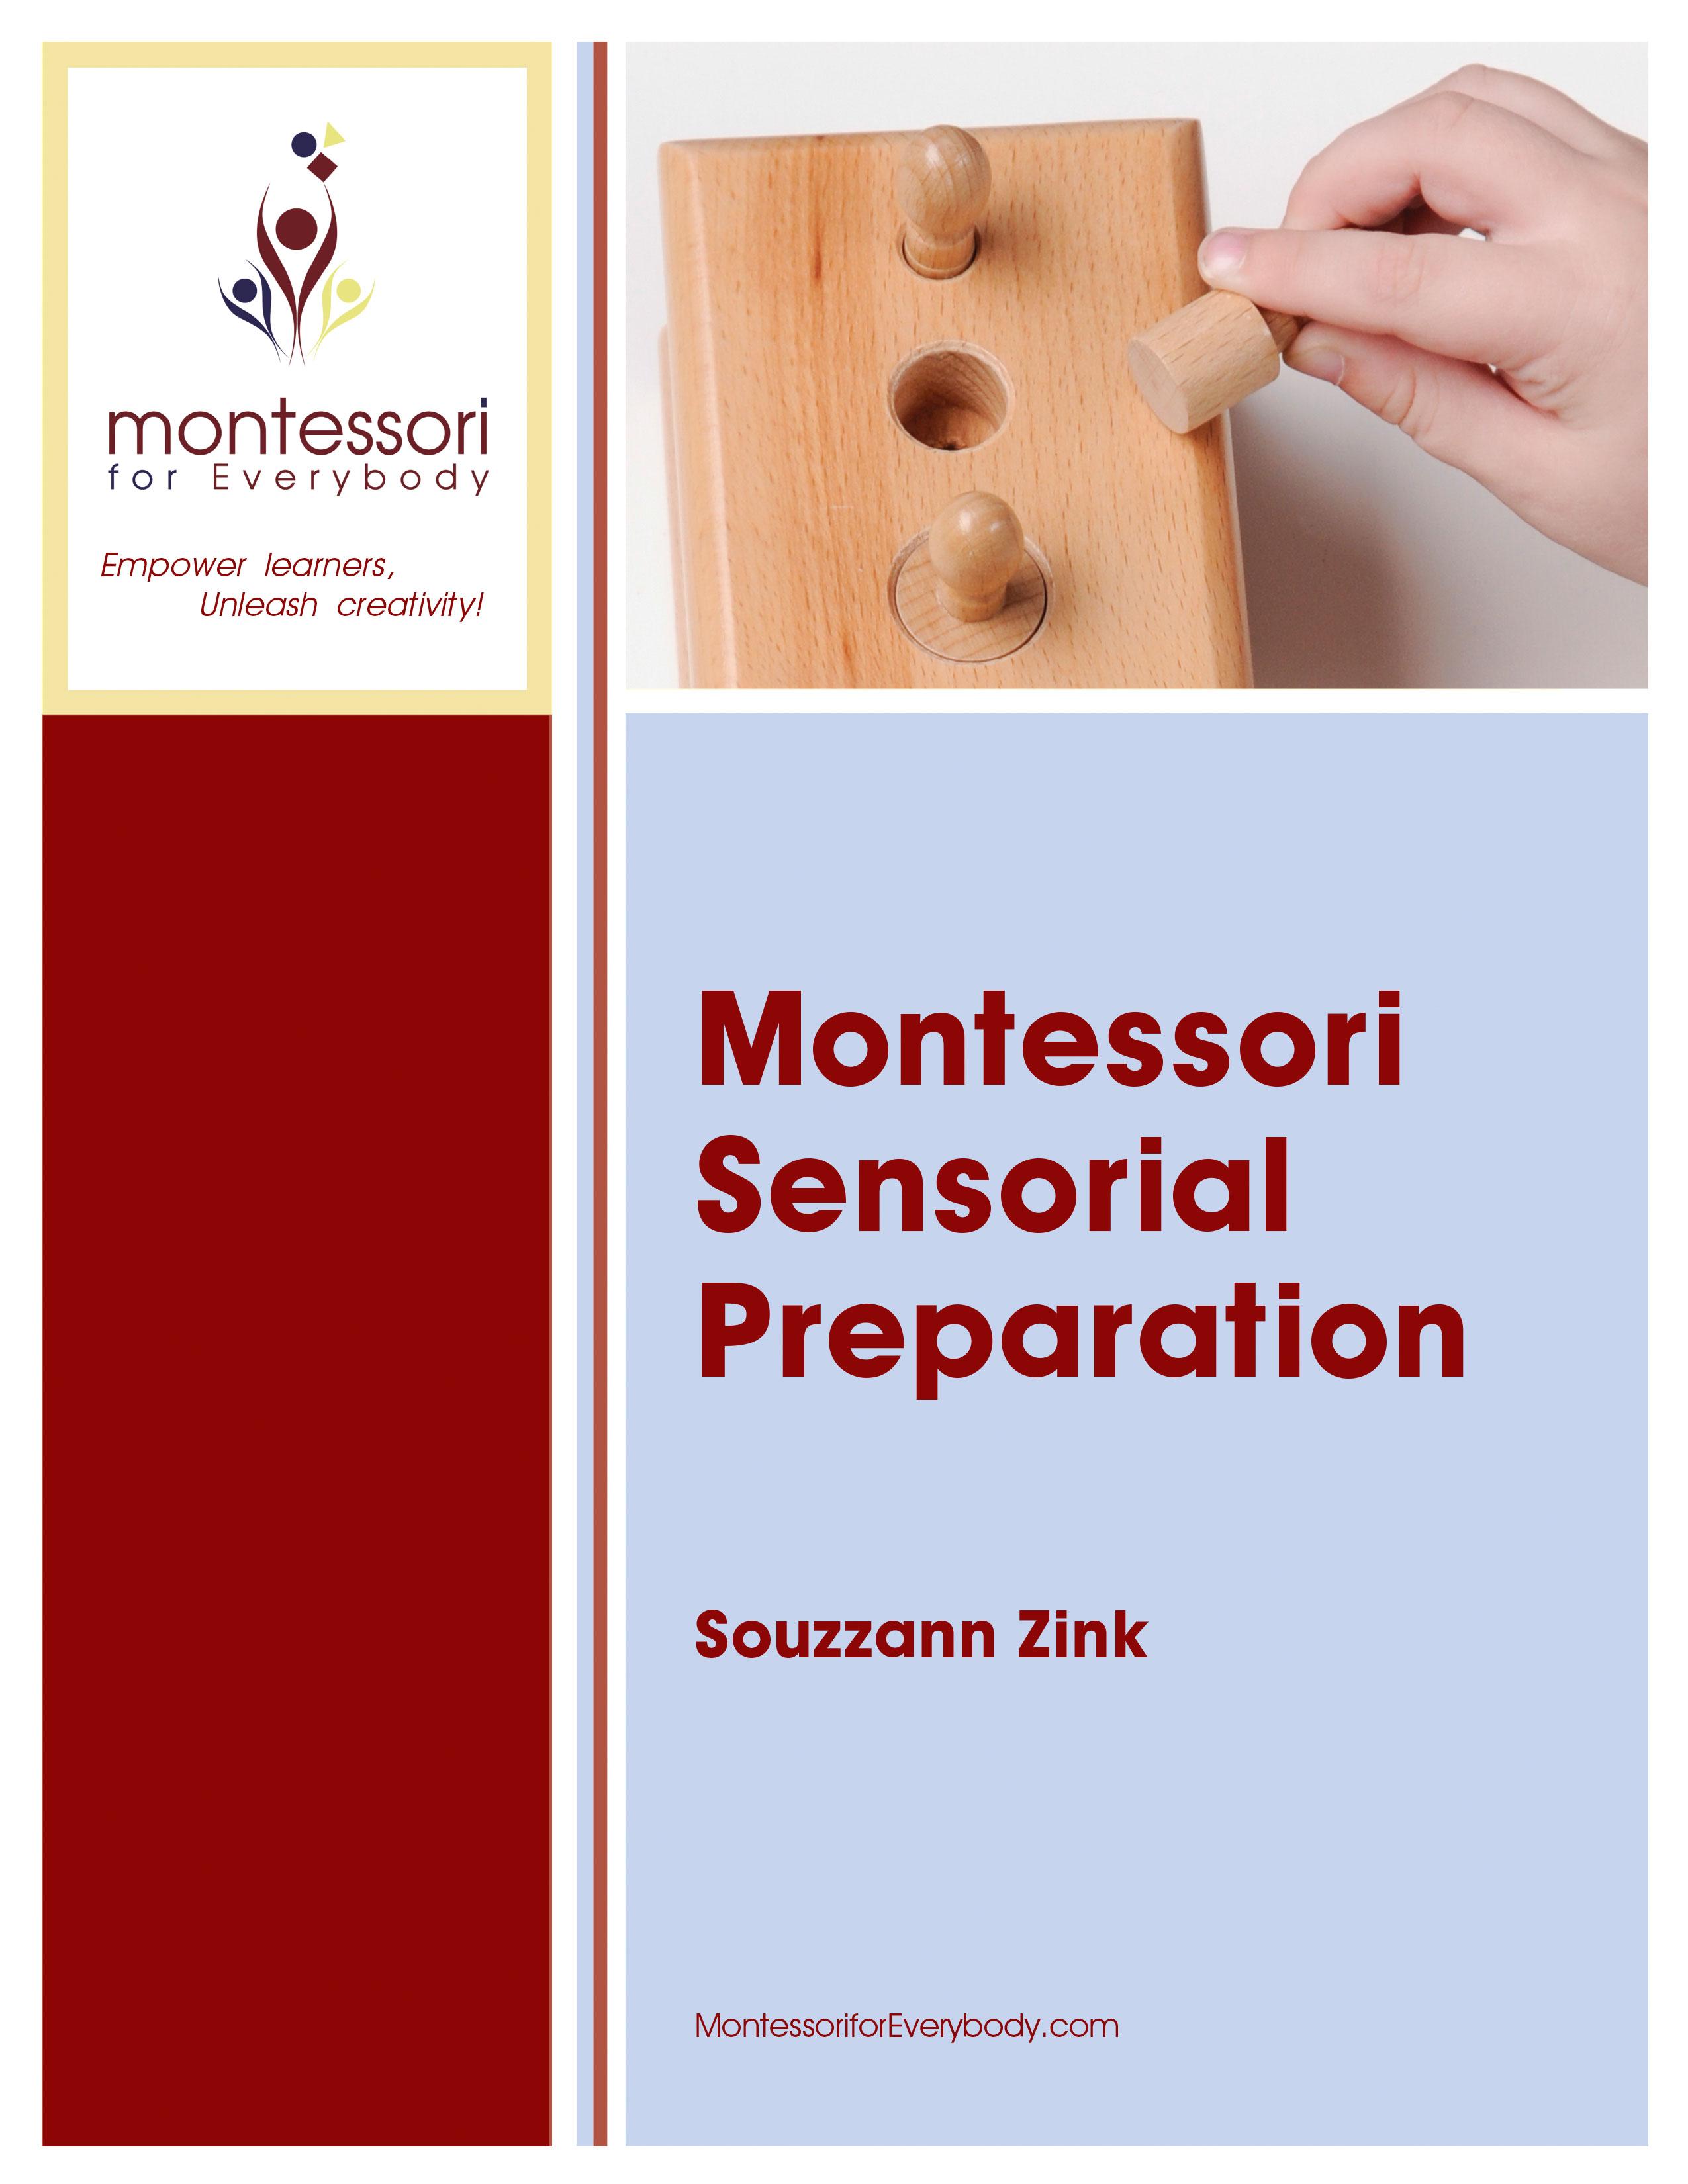 Montessori Sensorial Preparation